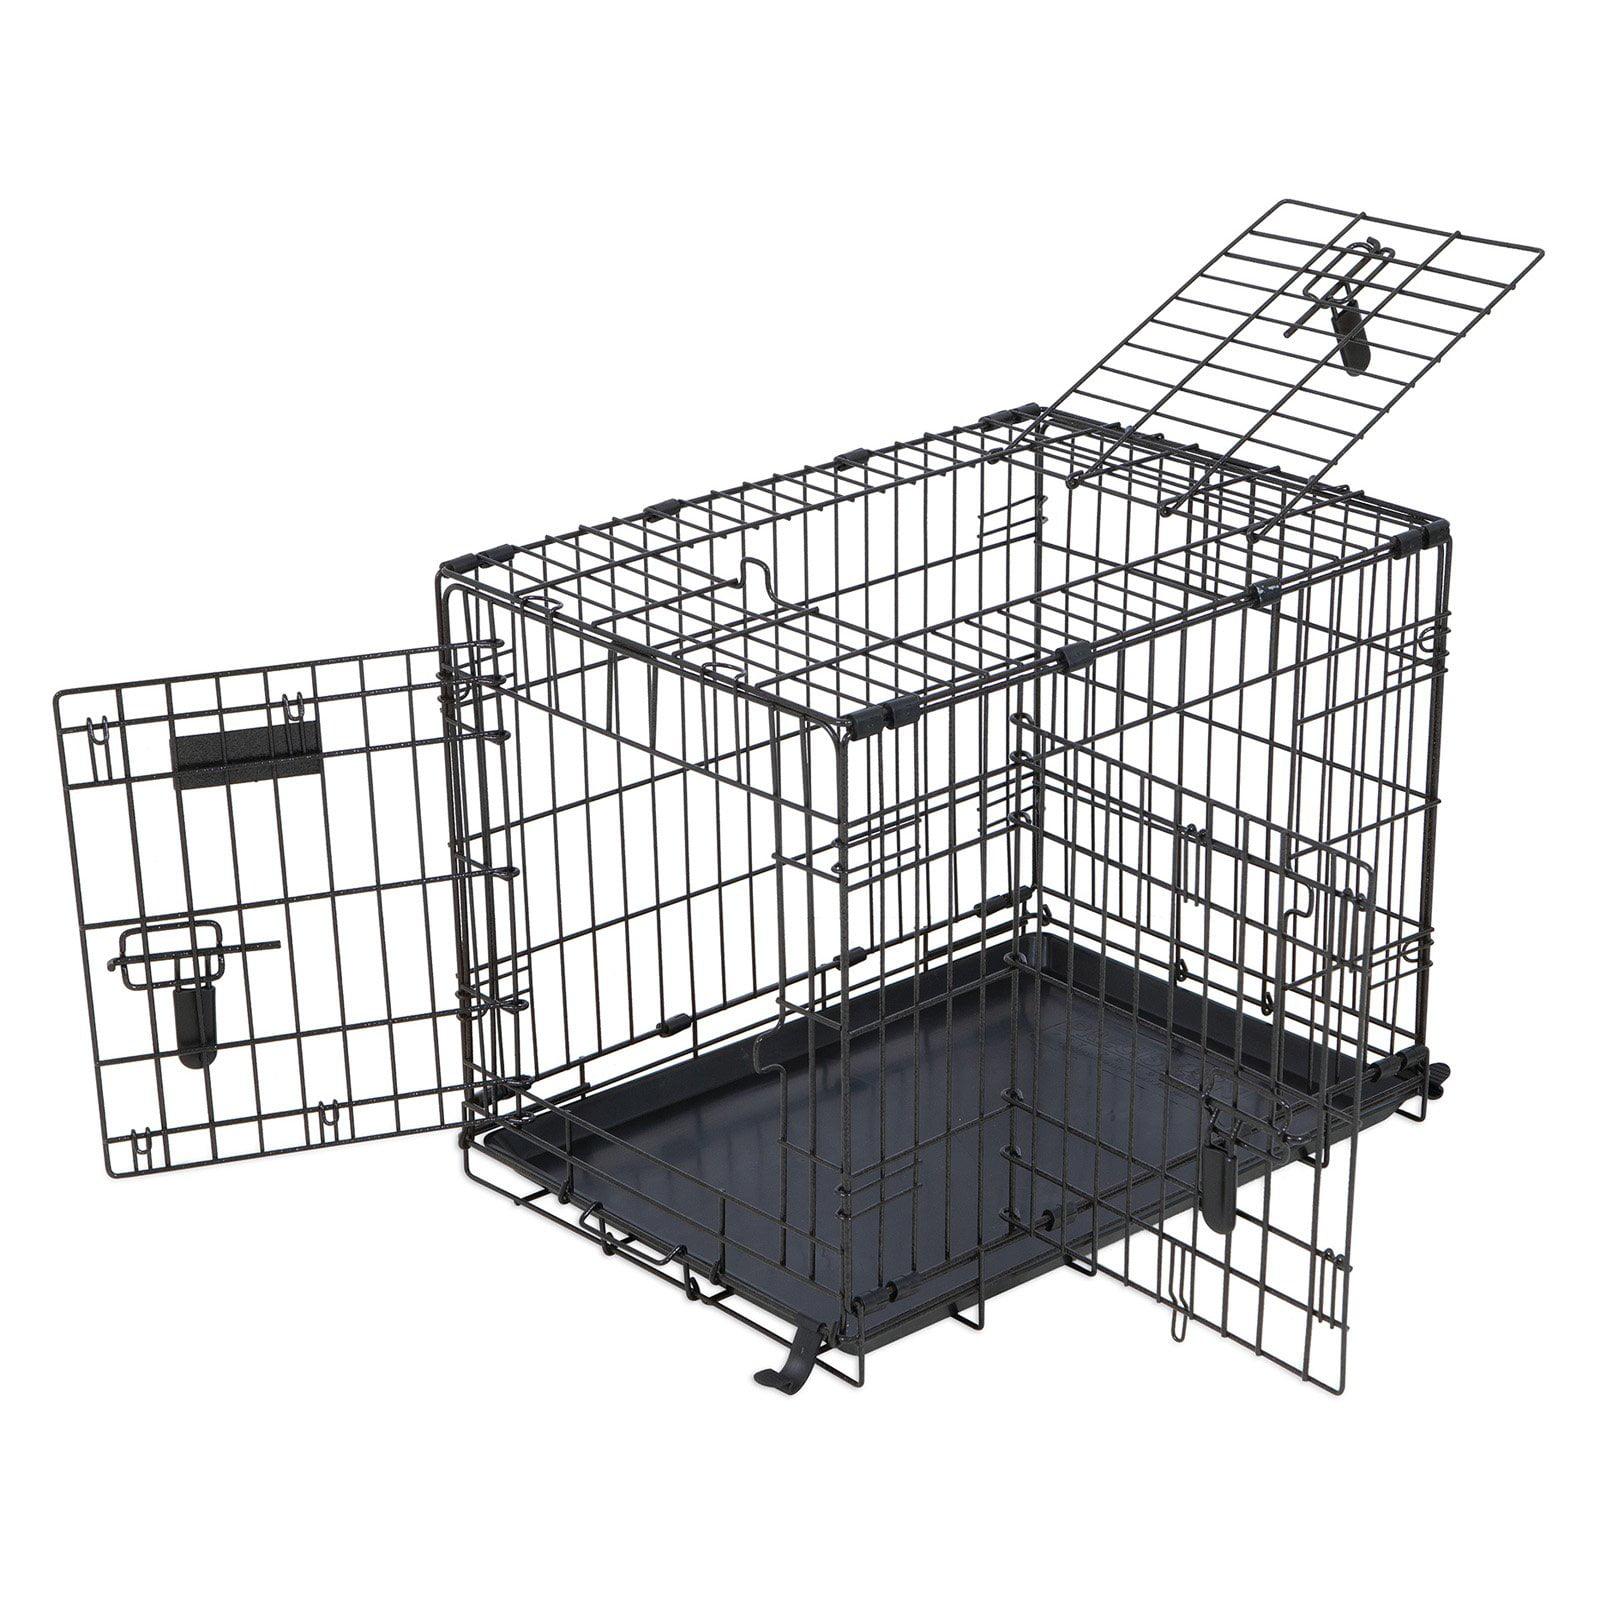 "Precision Pet 5000 Elite 3 Door Great Crate in Copper, 42"" L X 28"" W X 31"" H"